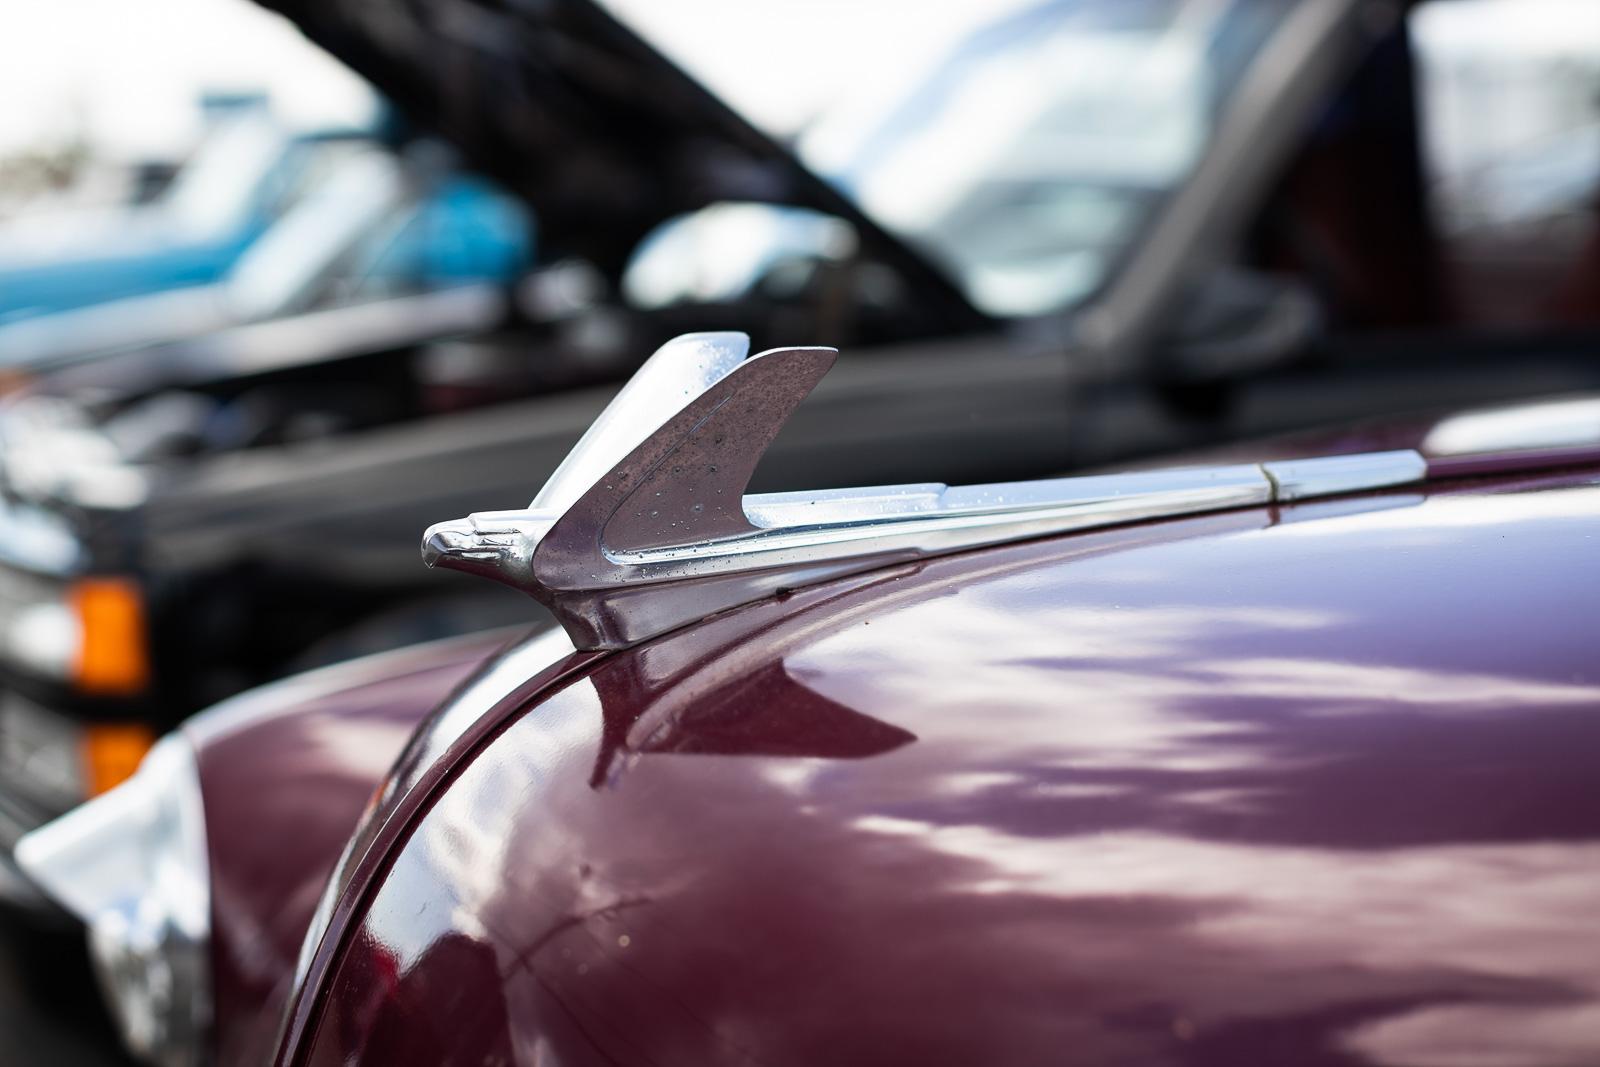 fat-guys-car-show-blog-48.jpg